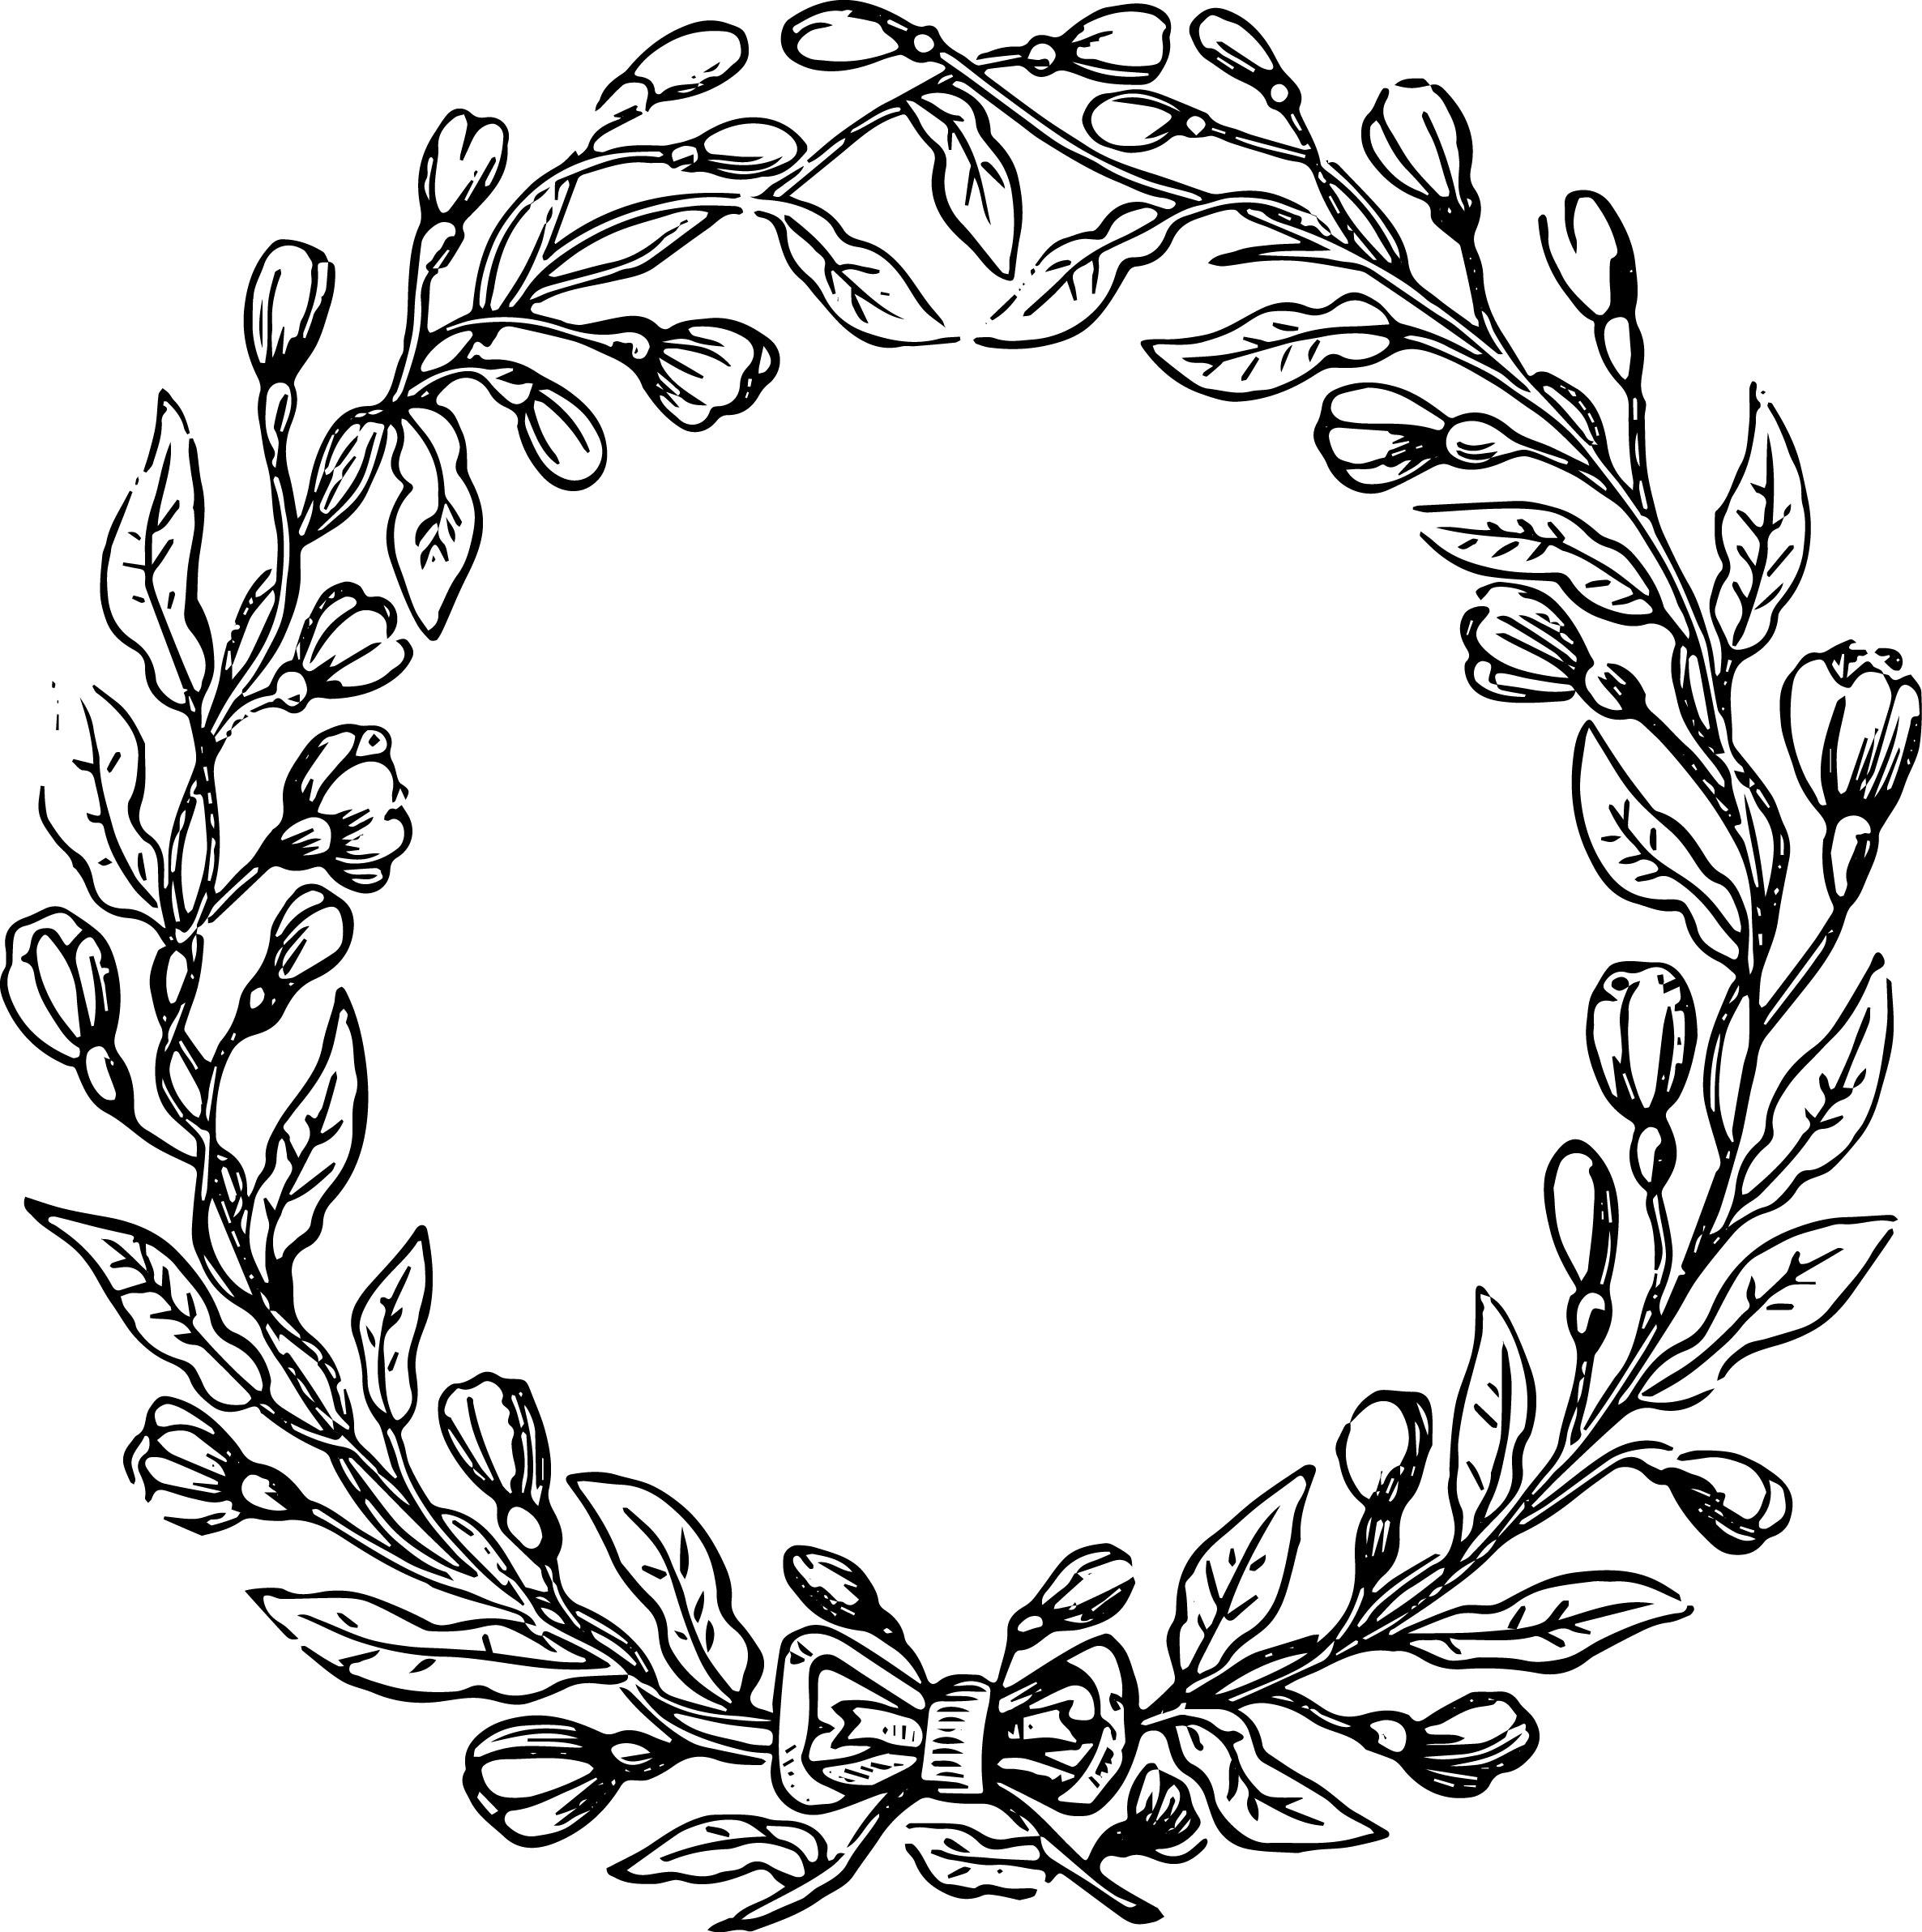 2372x2384 Art Deco Flower Wreath Designs Line Drawn